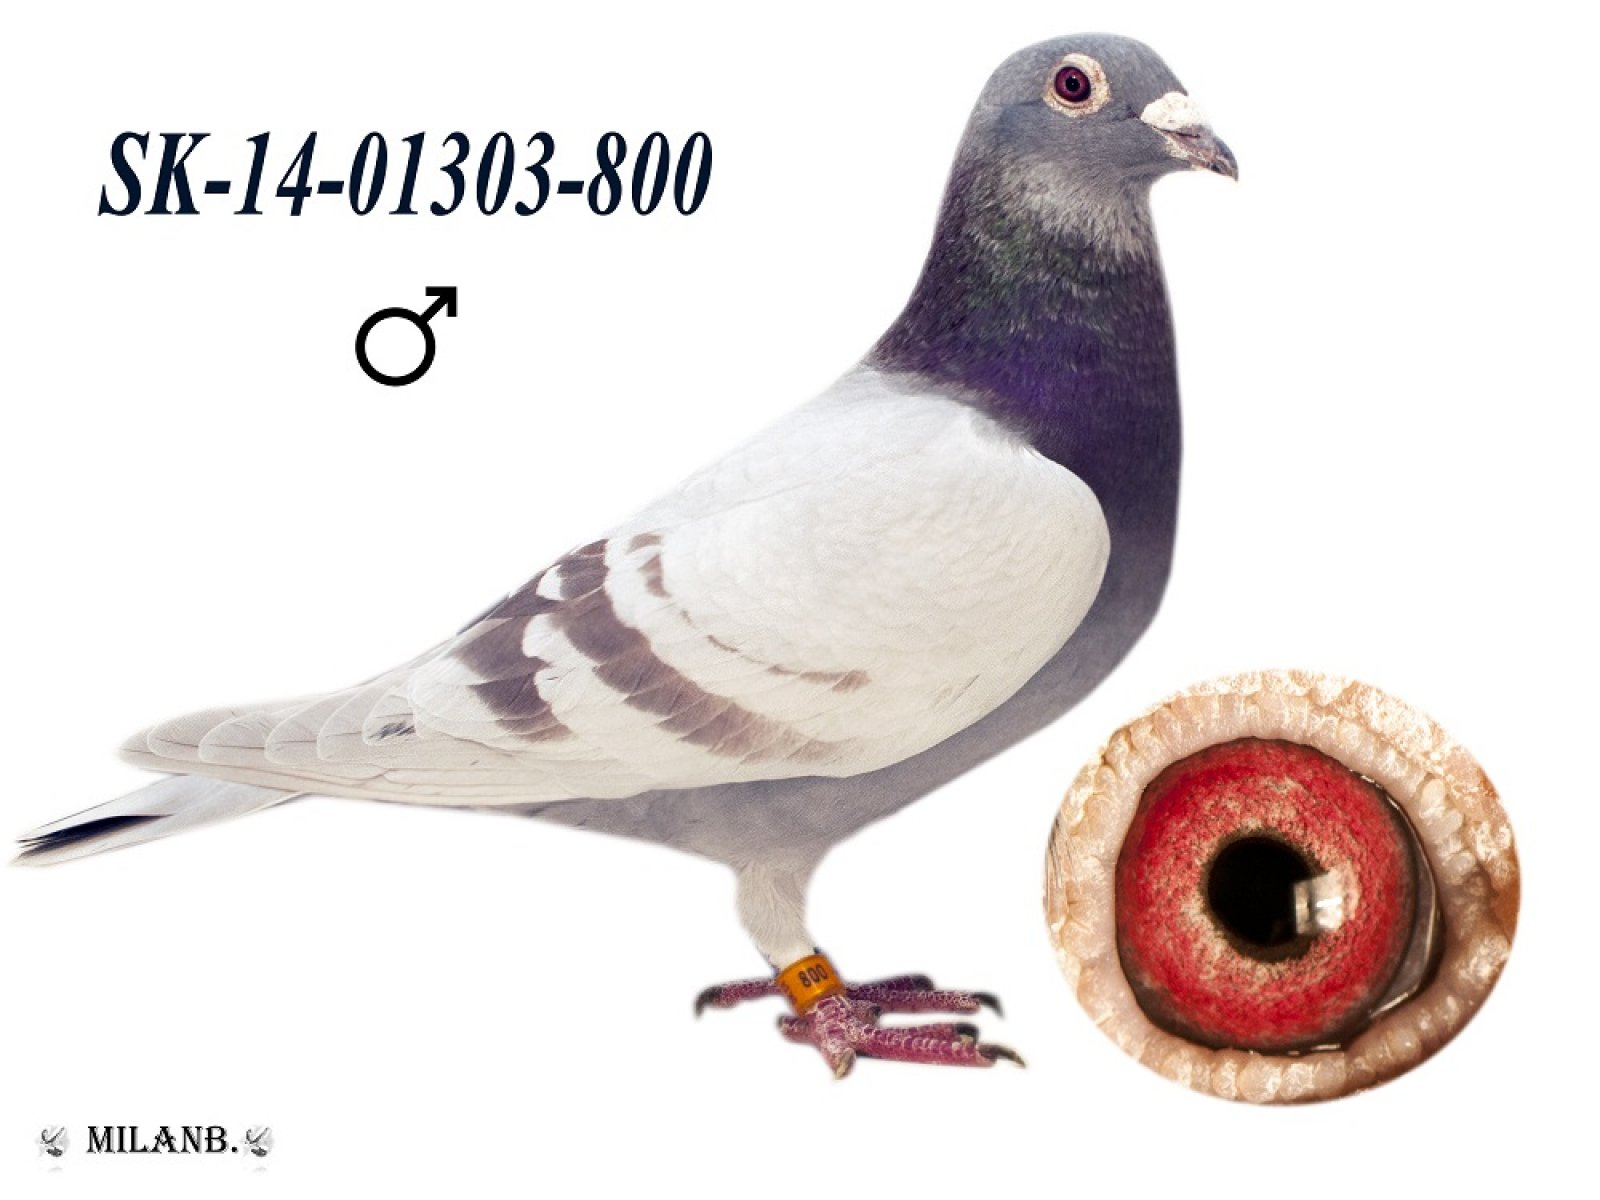 SK-2014-01303-800